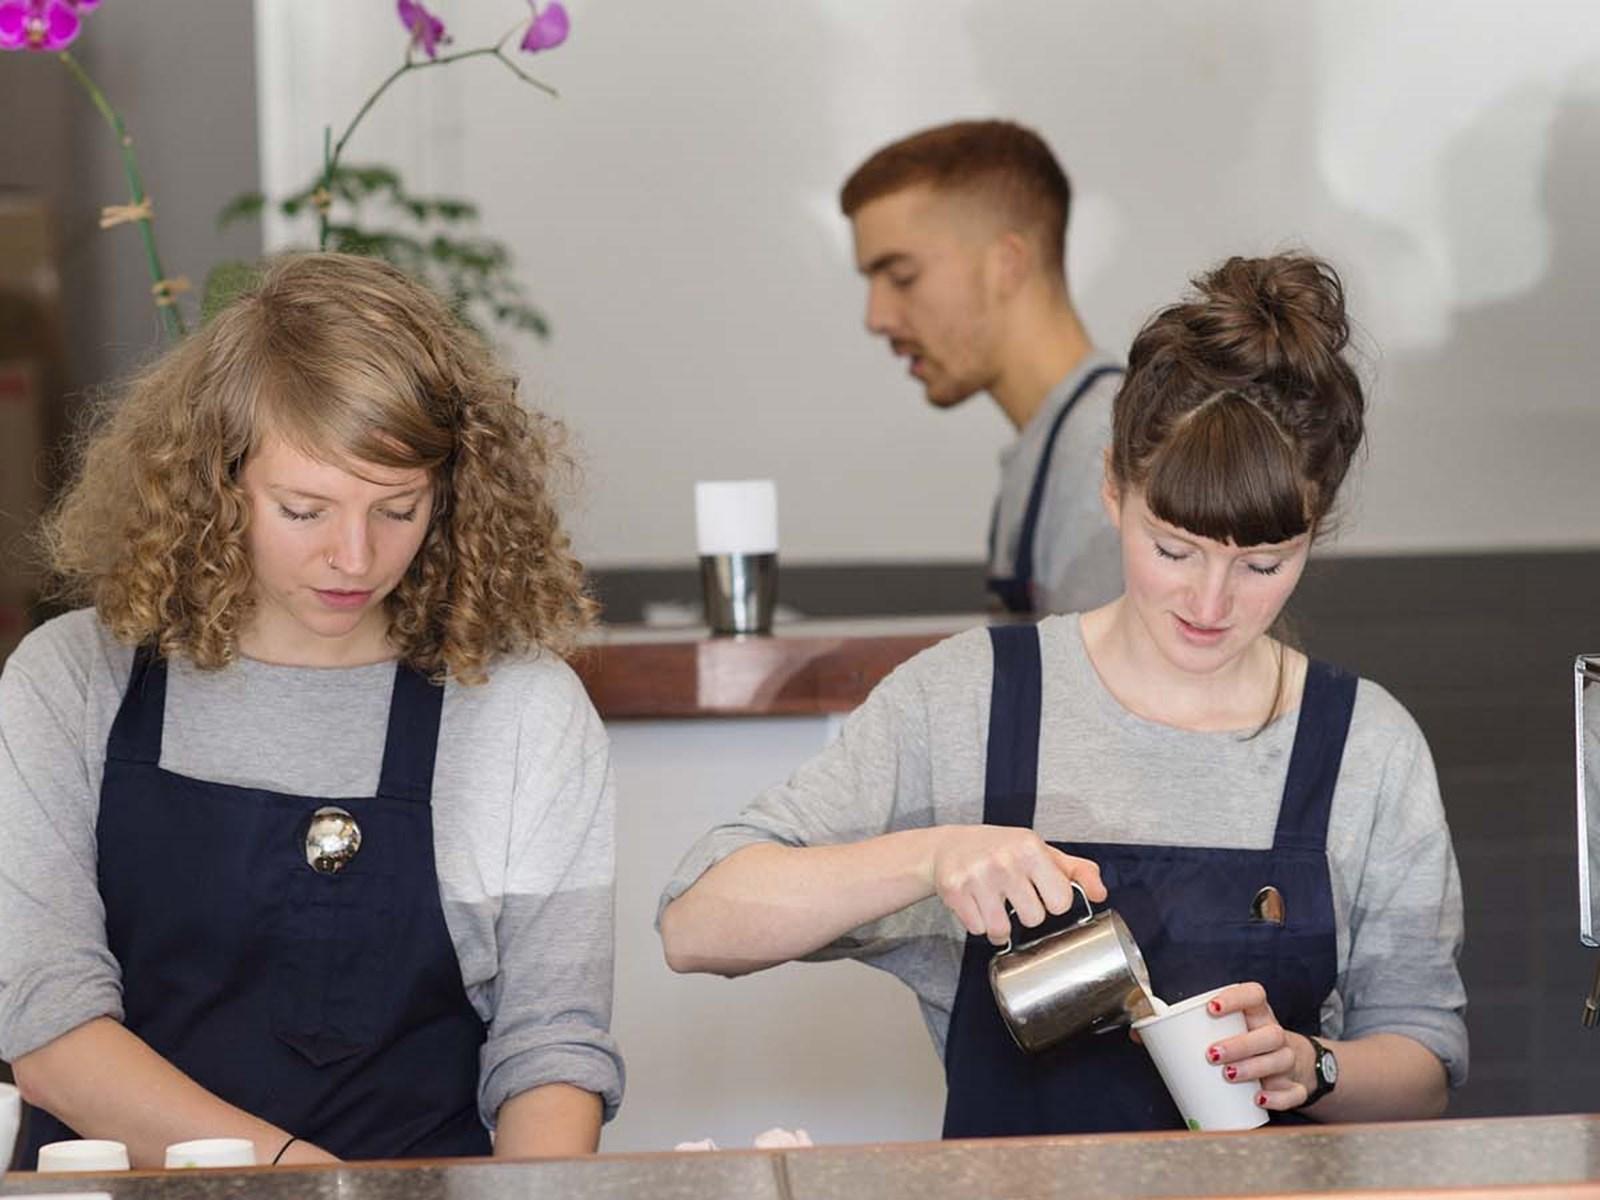 Everyday Coffee, Collingwood, Melbourne, Victoria, Australia